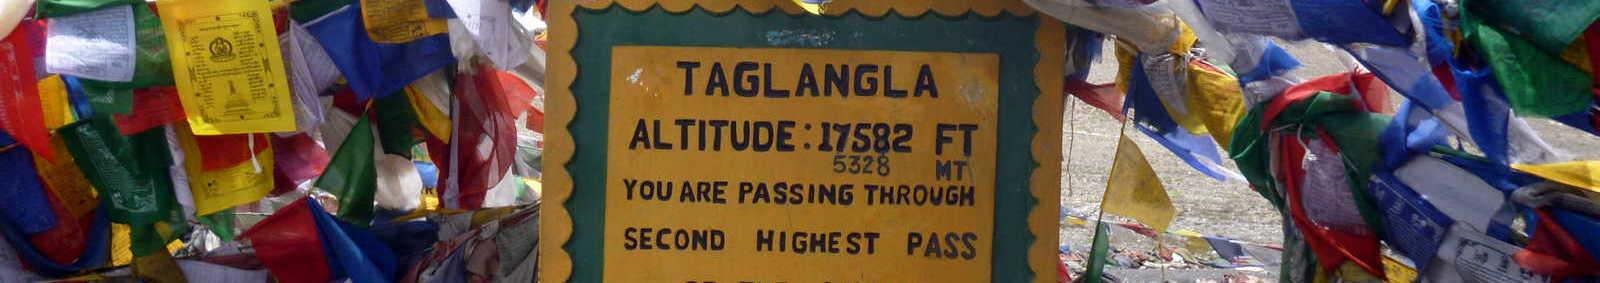 Taglangla altitude sign